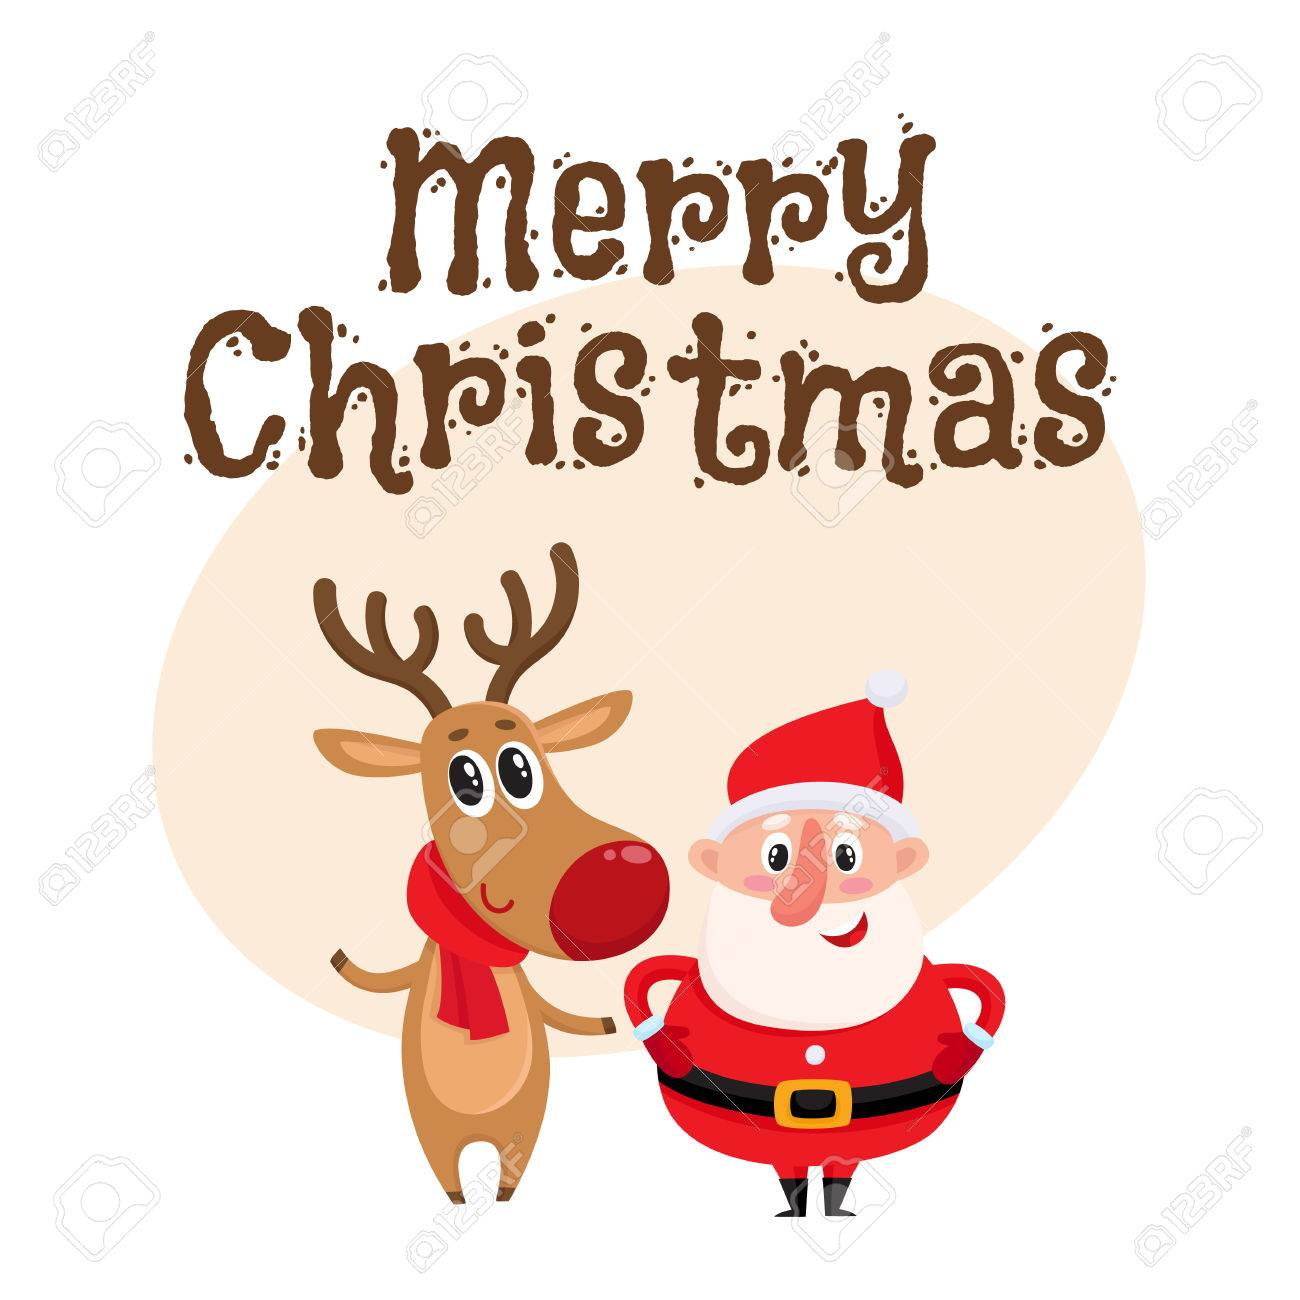 Weihnachten Funny.Stock Photo